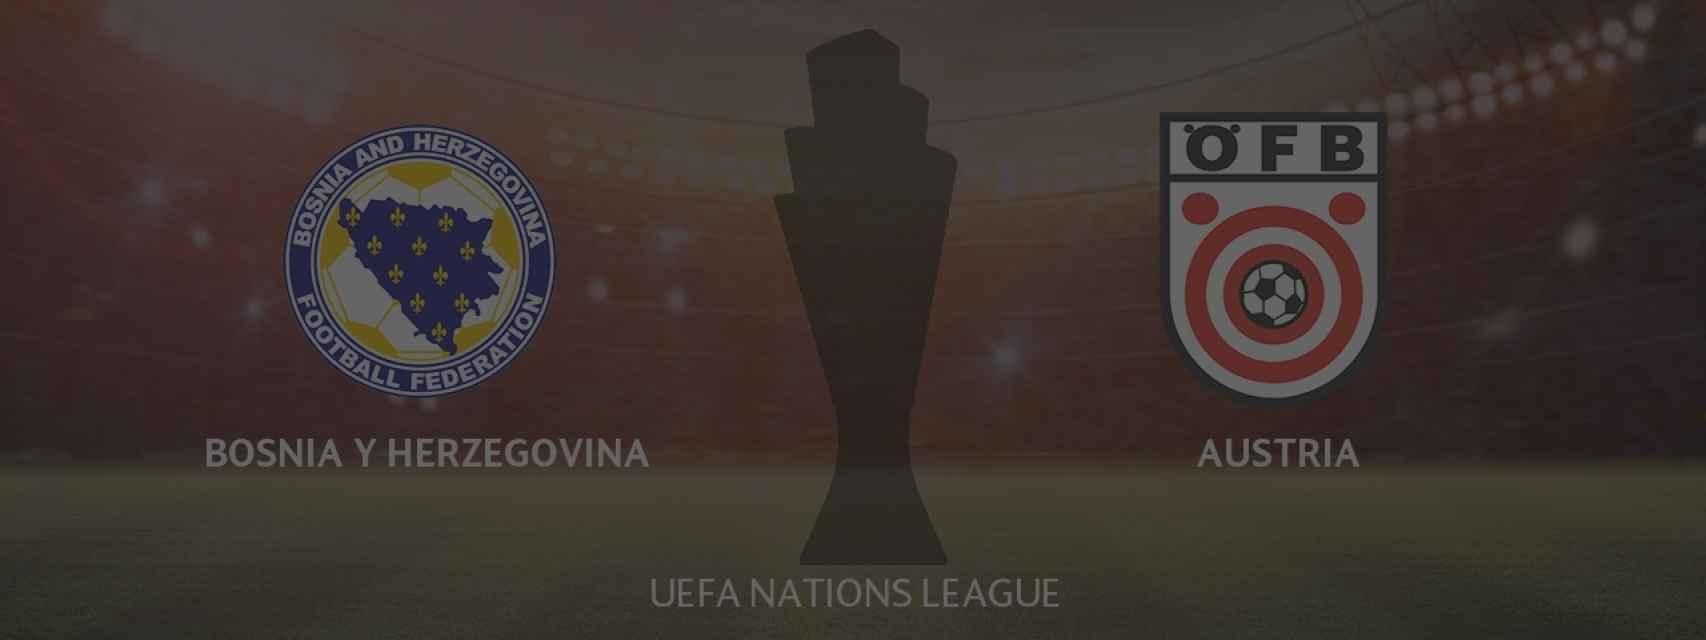 Bosnia y Herzegovina - Austria, UEFA Nations League